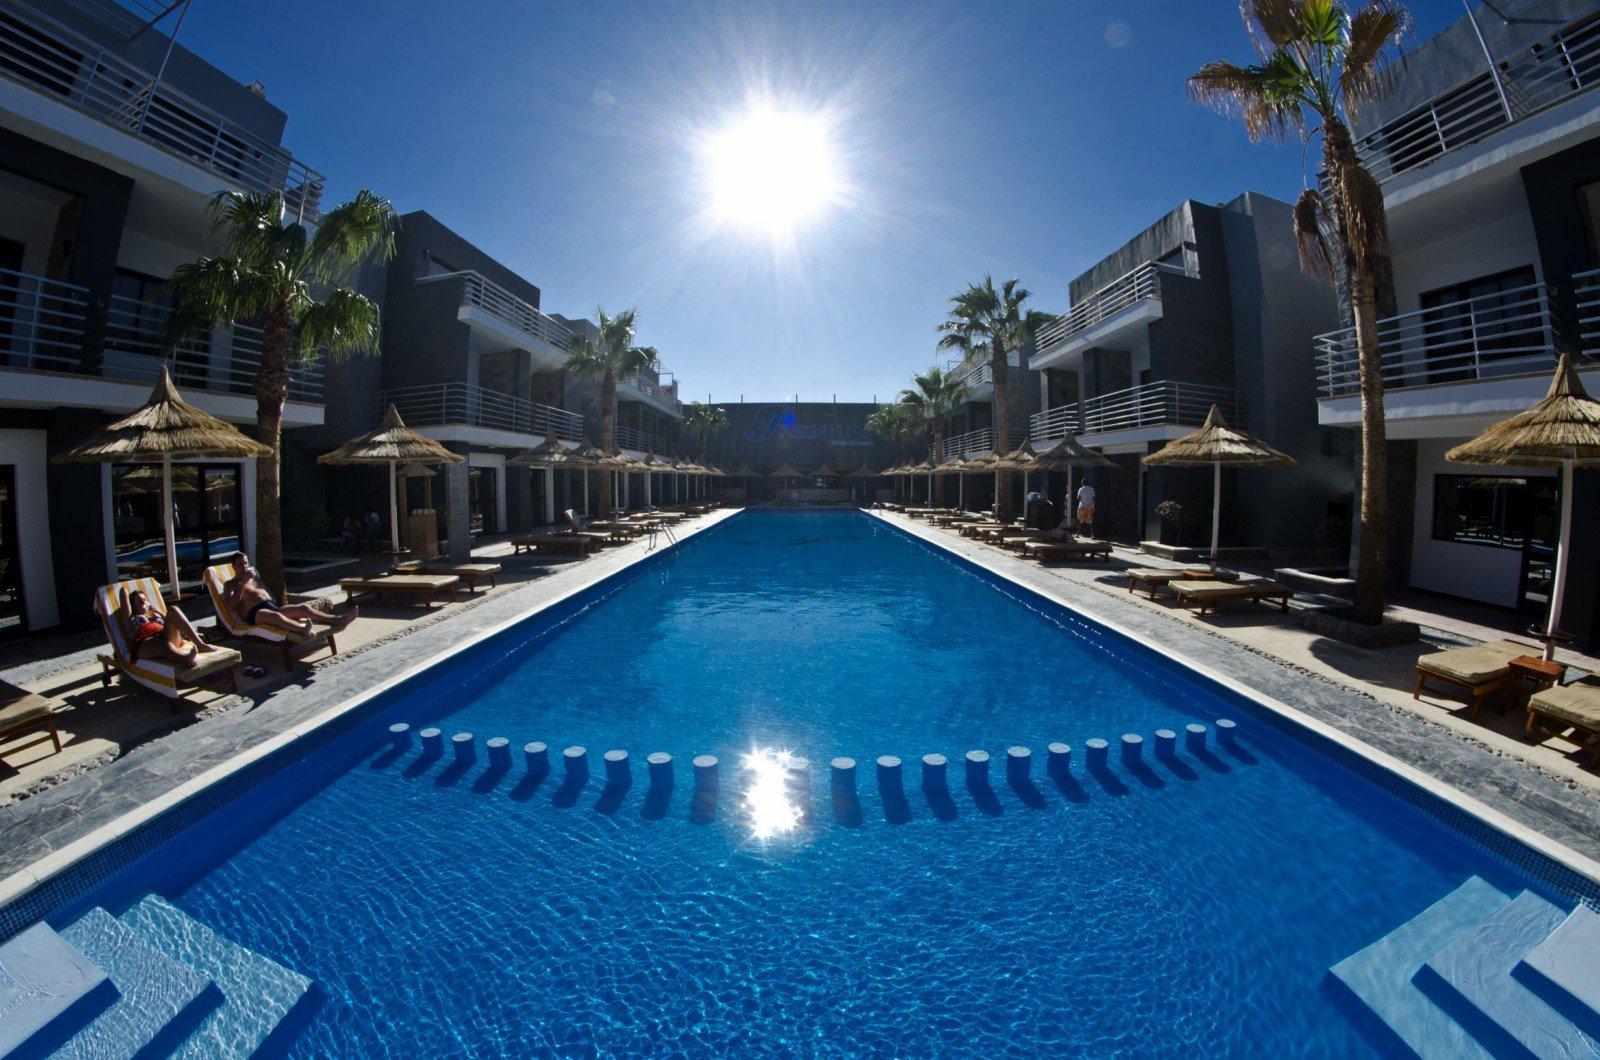 Premium Seagull Hotel And Resort